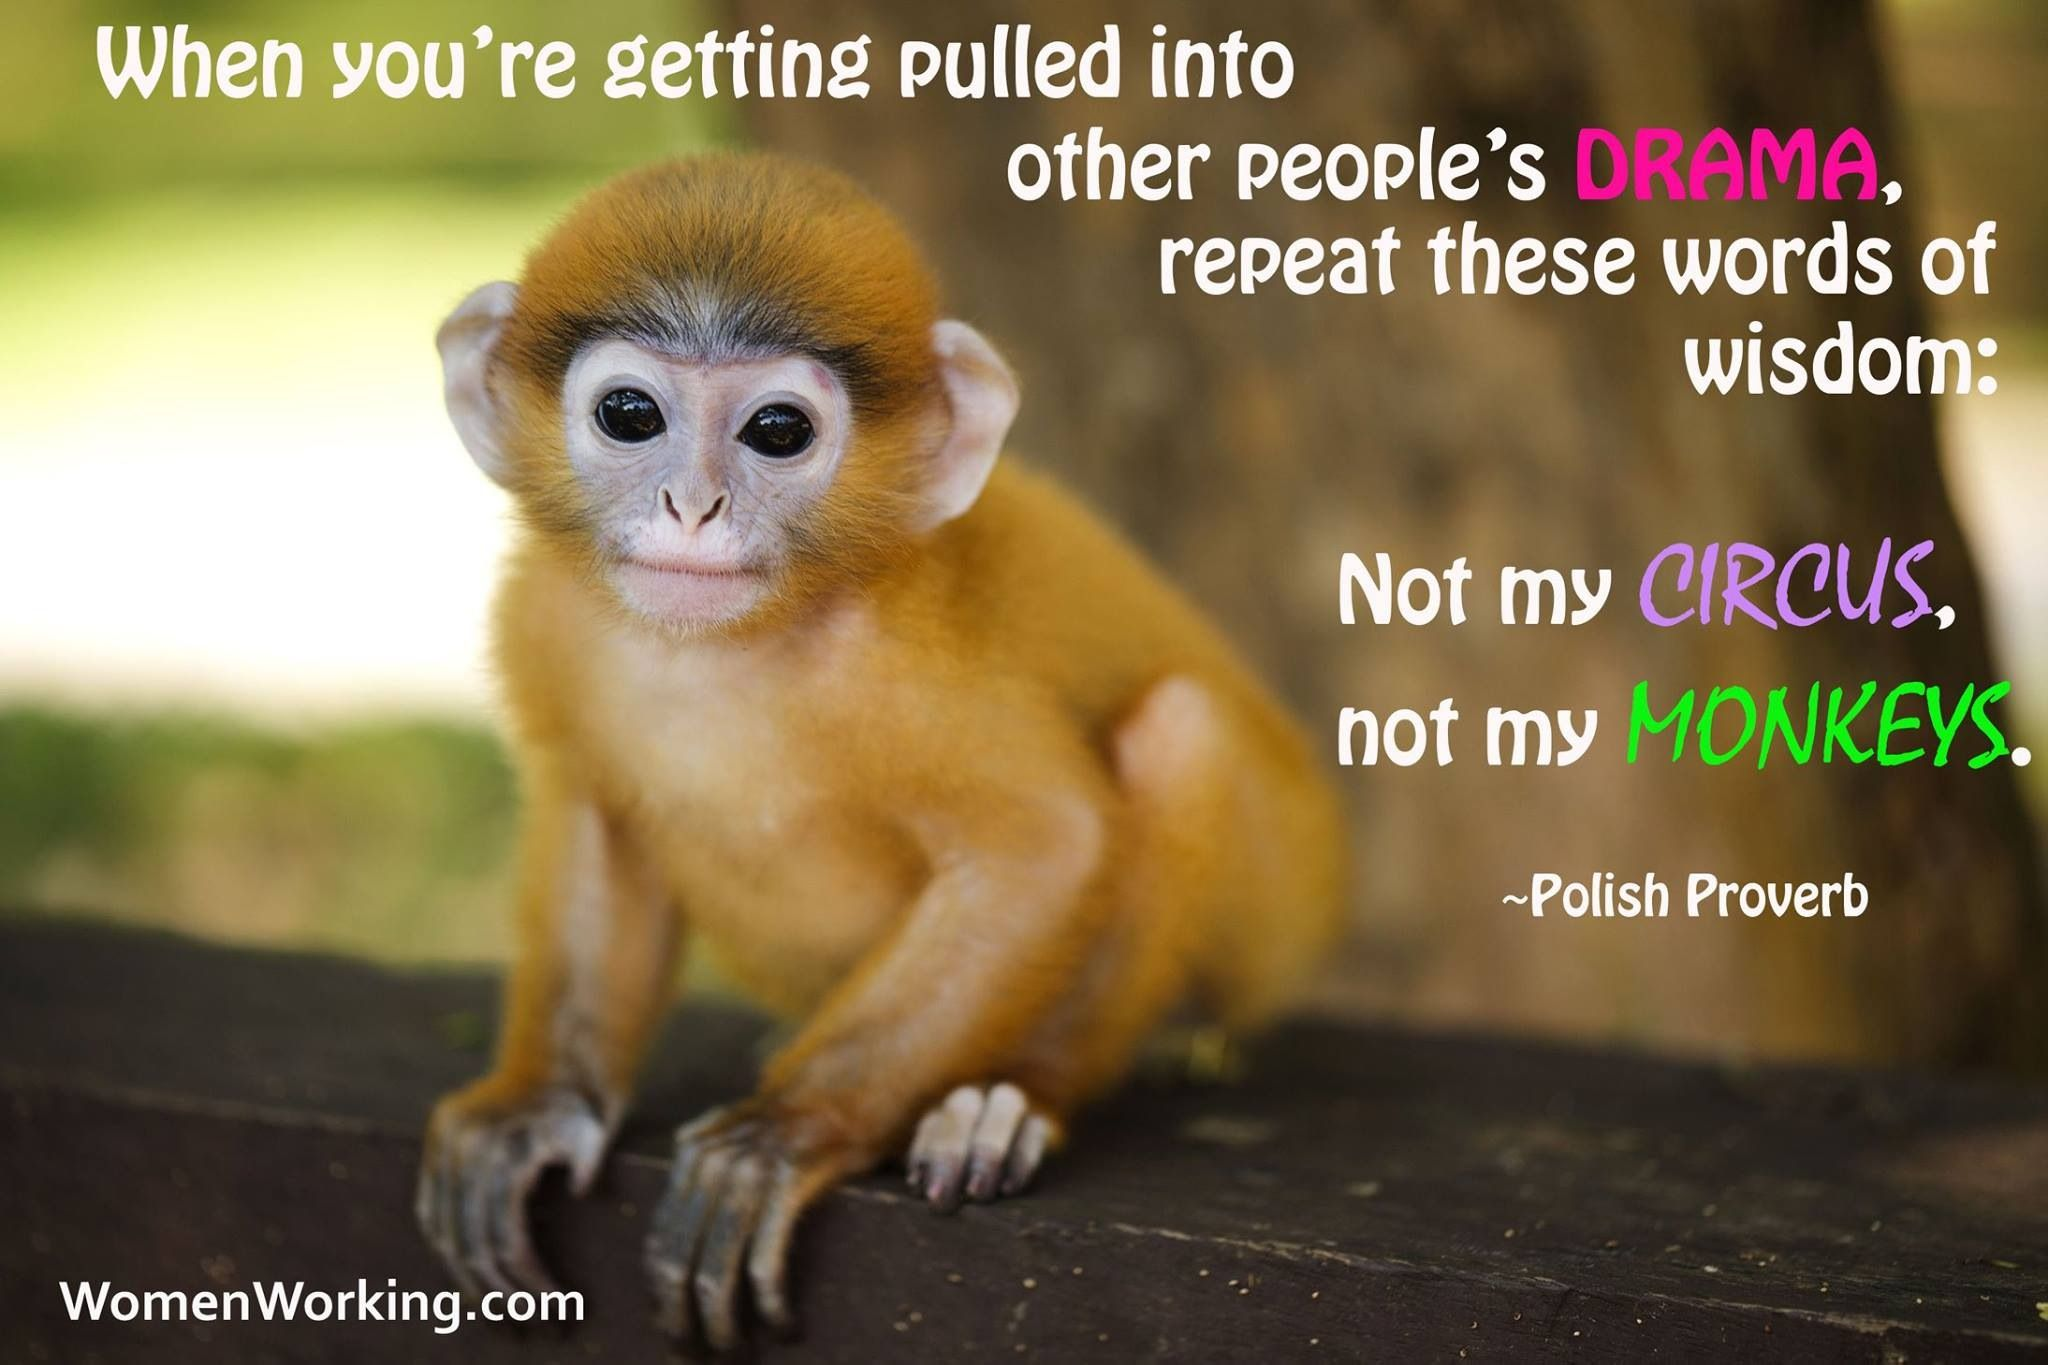 Not my circus! I don't do drama.